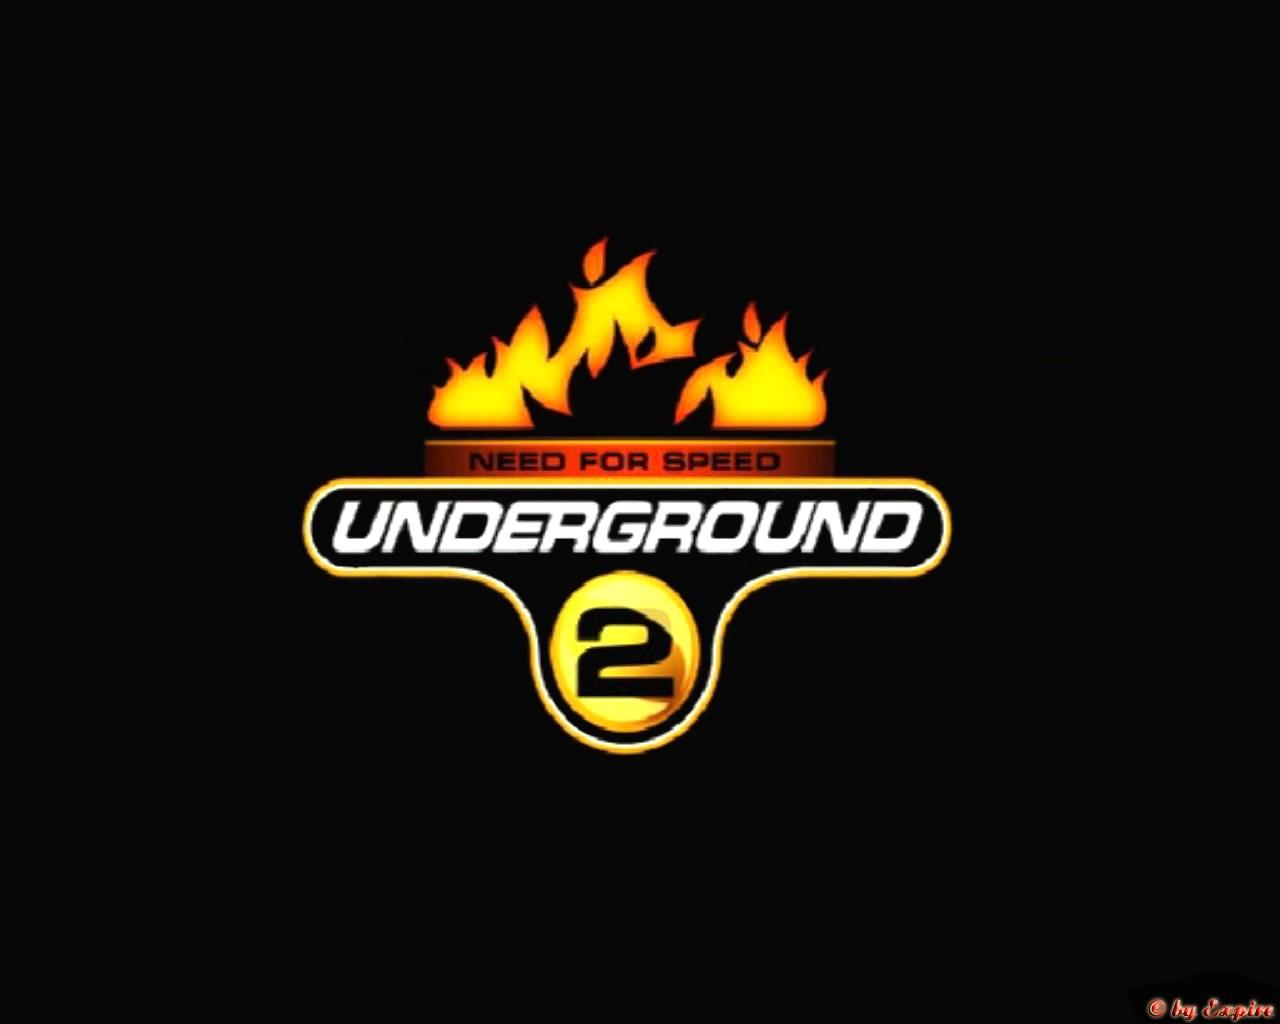 Need for speed 2 underground porn erotica movie